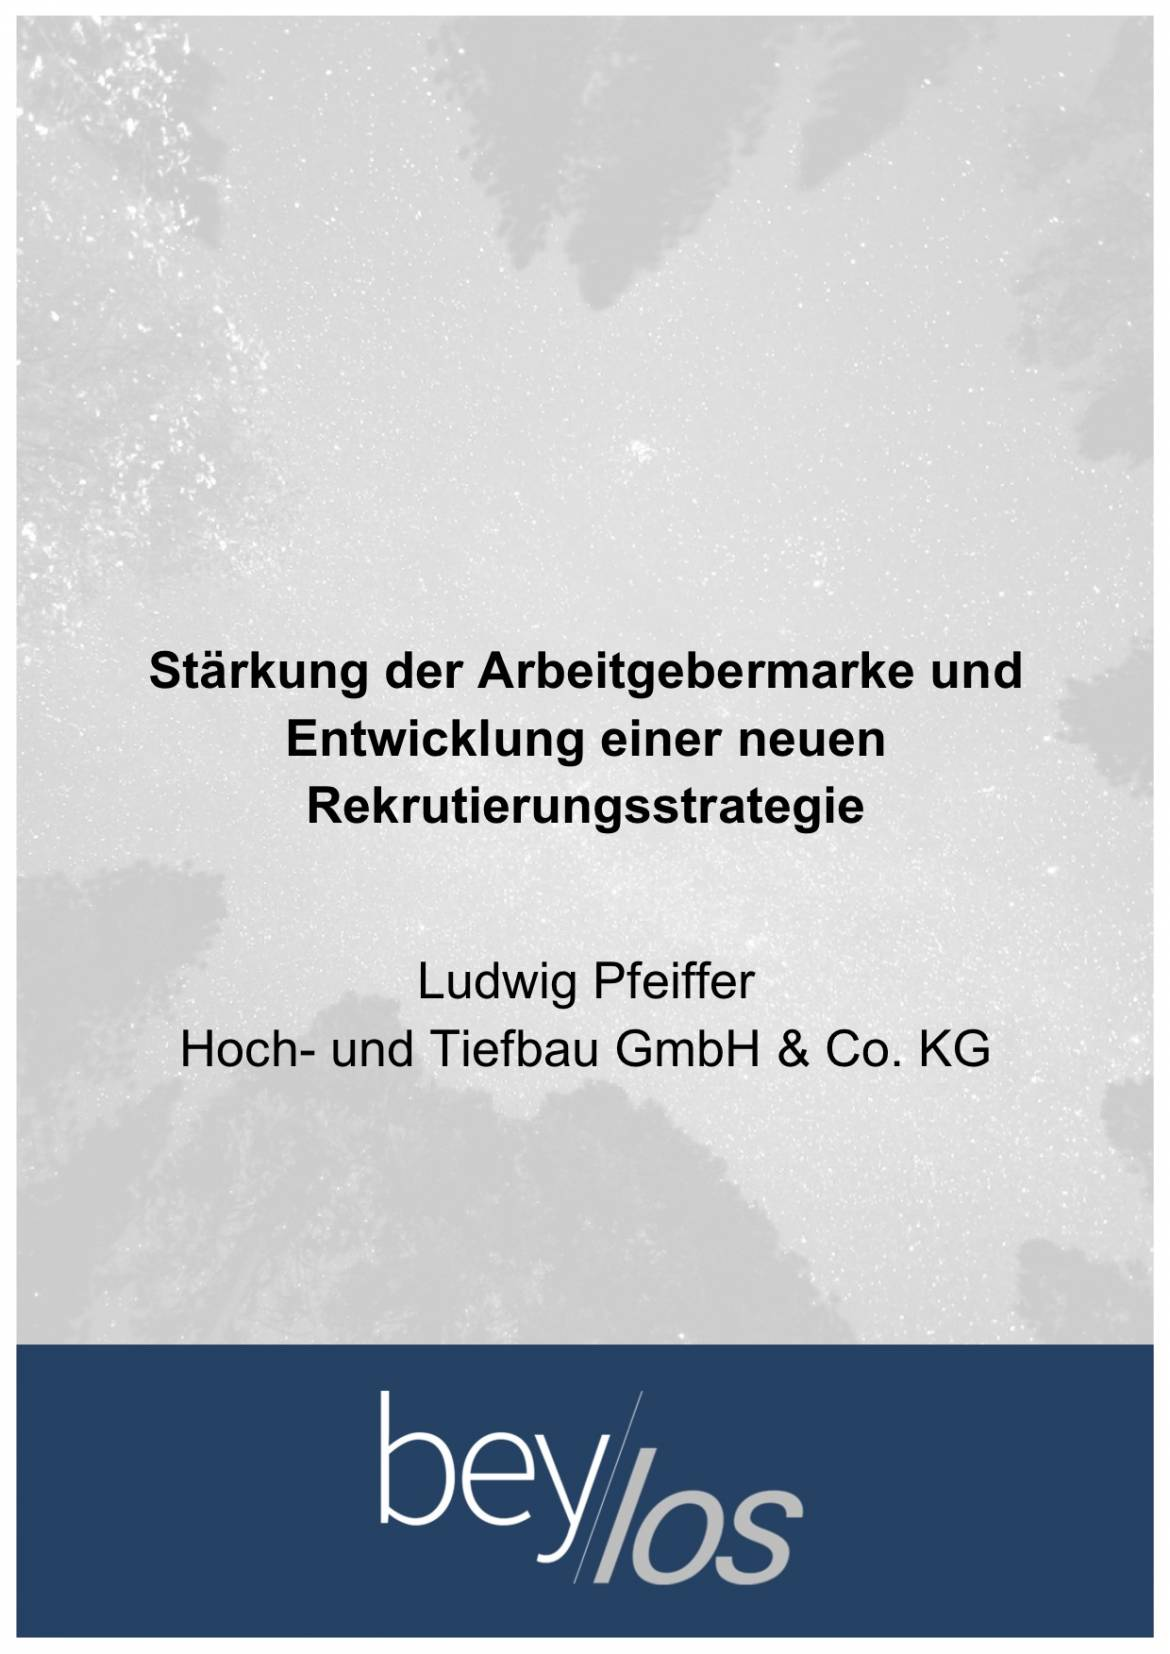 18-03x24_Rekrutierungskonzept-Ludwig-Pfeiffer.jpg